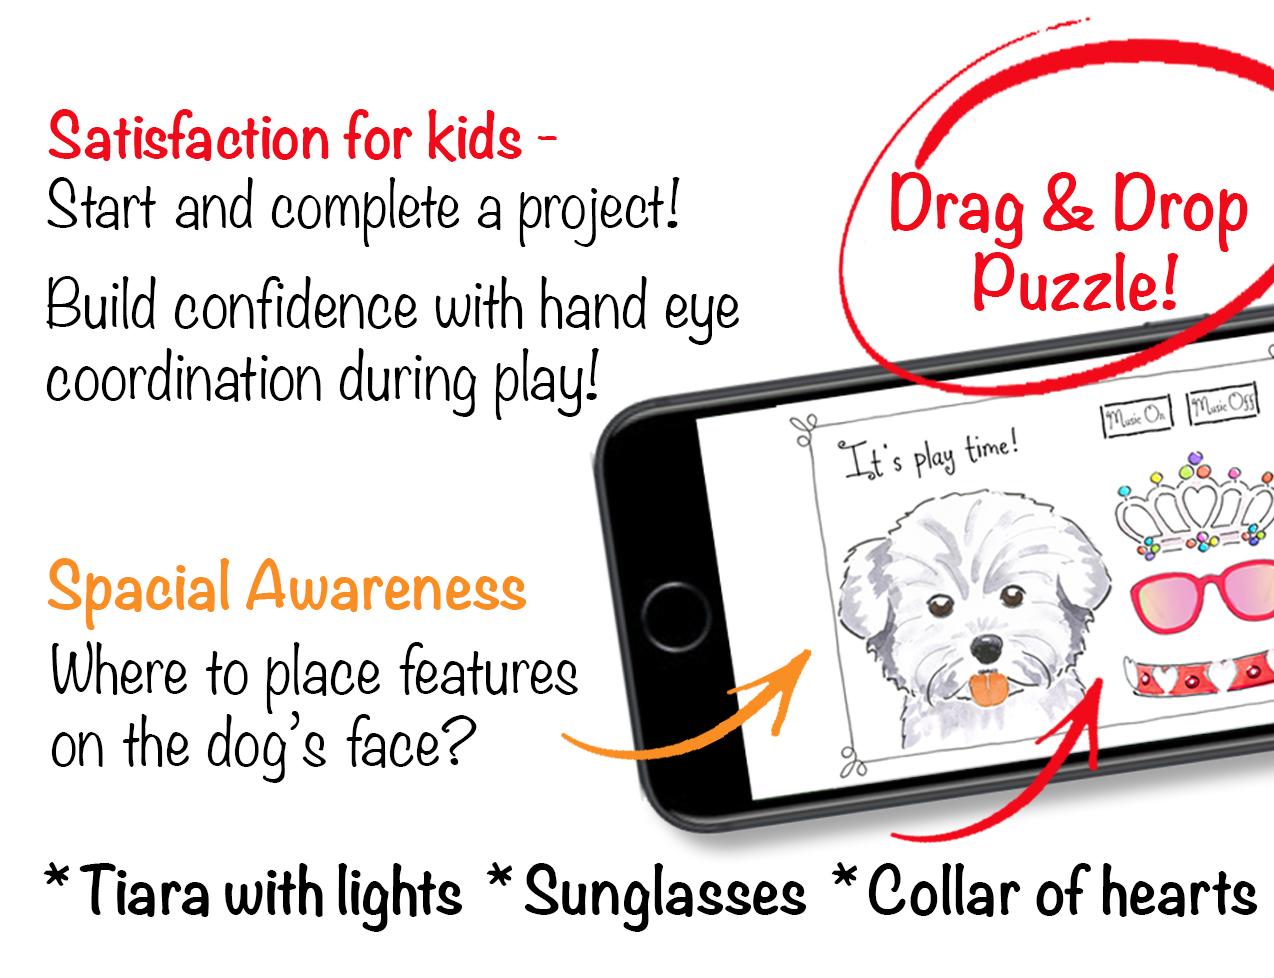 drag-&-drop-iphone-spatial-awareness-lindybelinda-Apple-app-dog-half.jpg